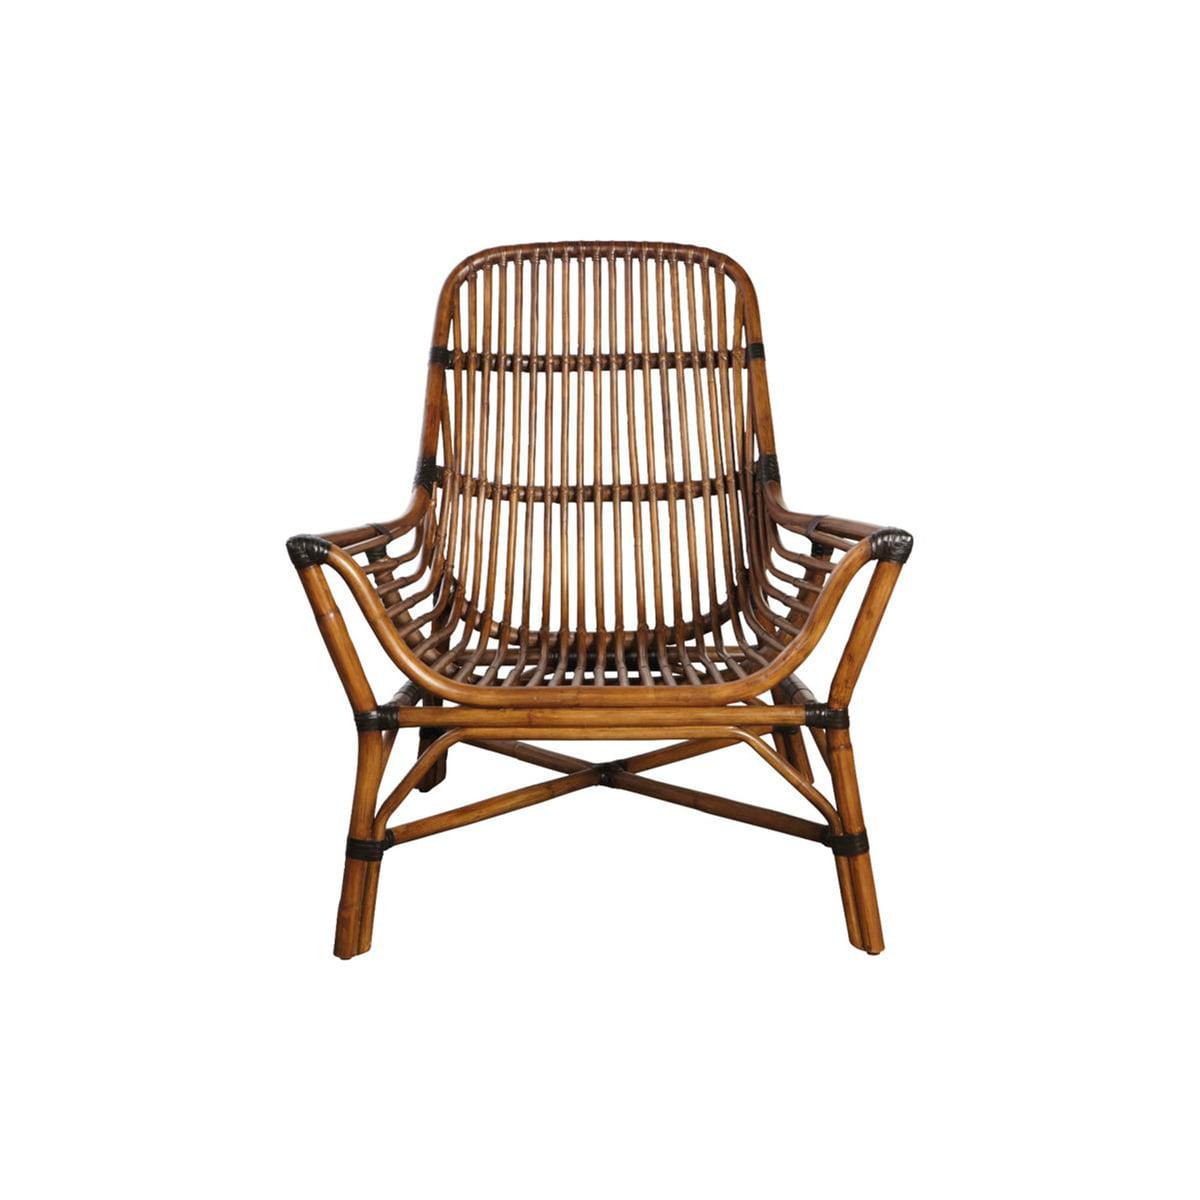 House Doctor Colony Lounge Chair Rattan braun